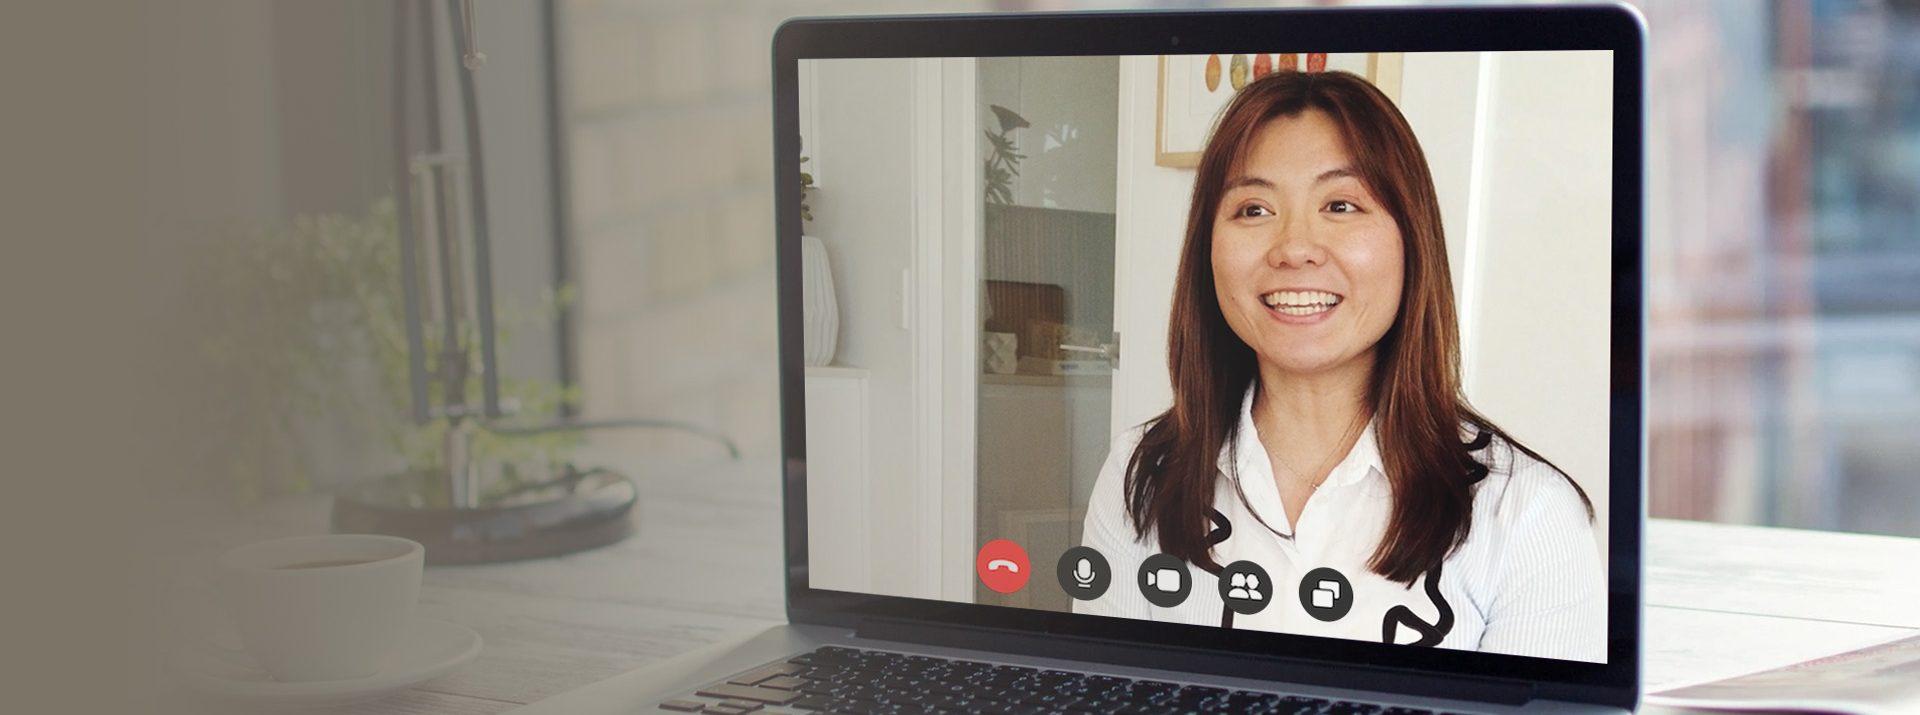 We offer telehealth consultations